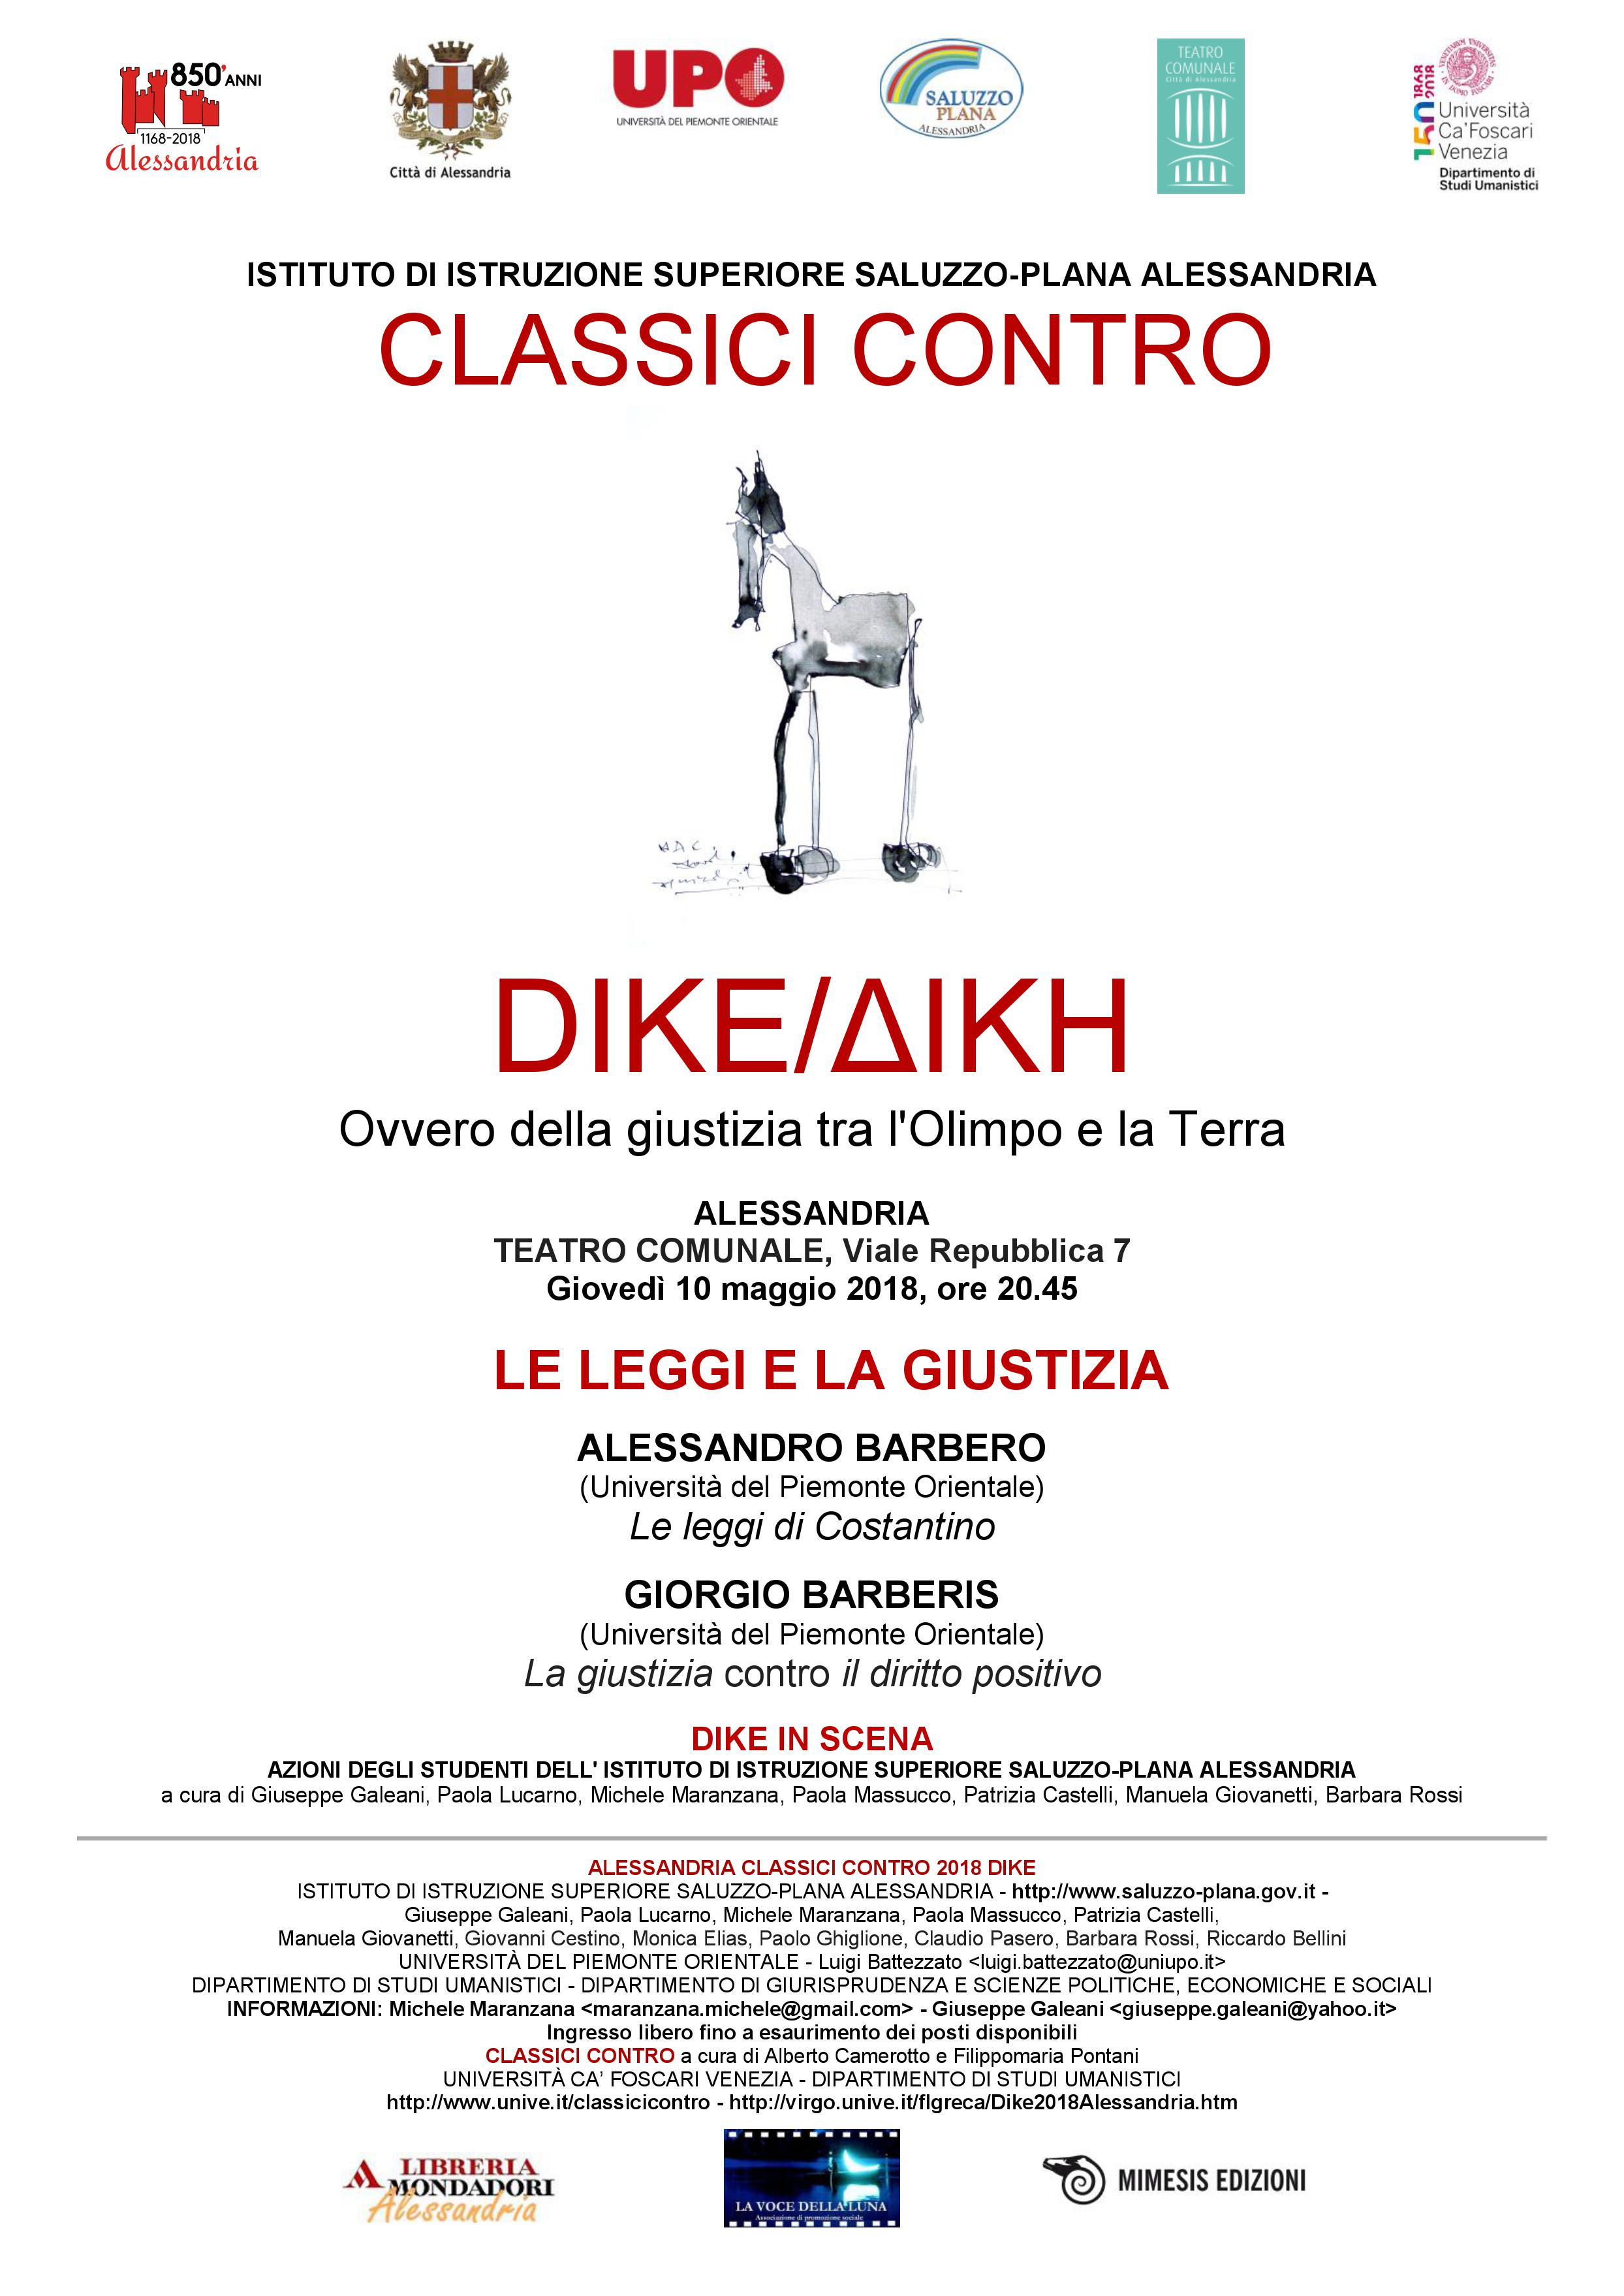 Classici Contro Dike Alessandria 2018